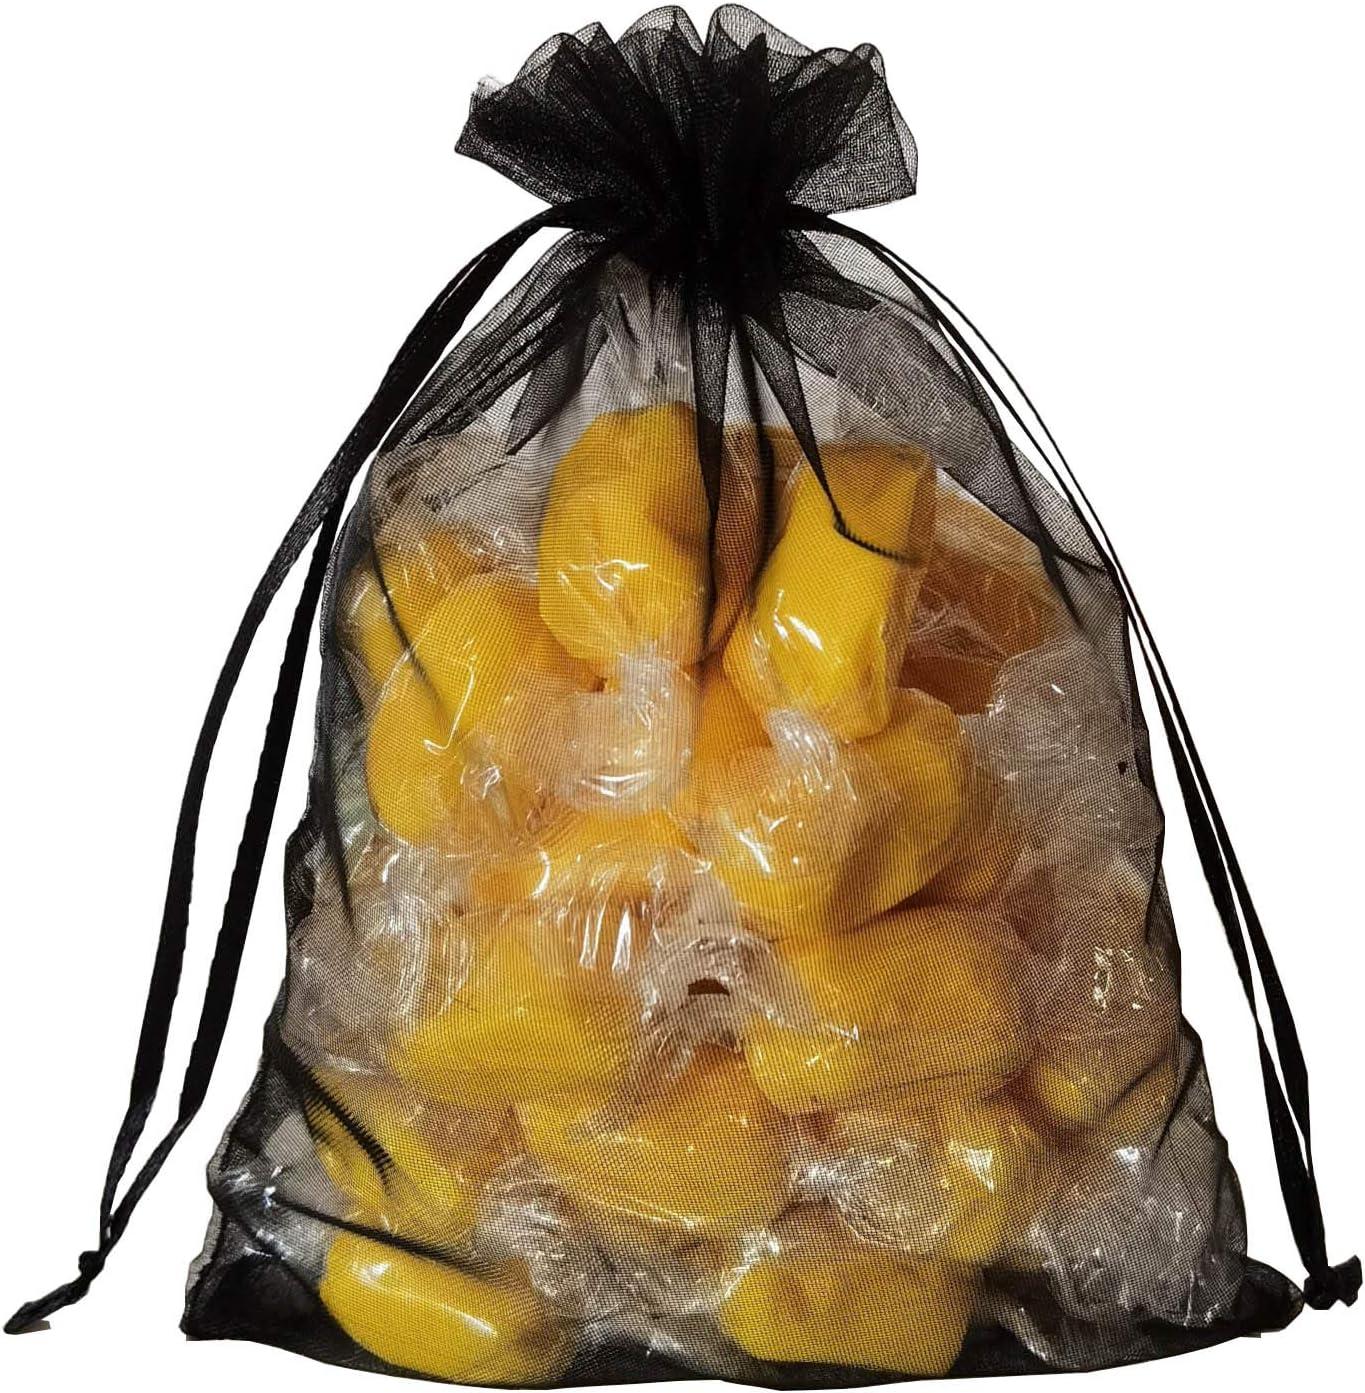 100pcs Sheer Ranking TOP20 Black Organza Small Drawstring Bags 5x7 I [Alternative dealer] Wrap Gift